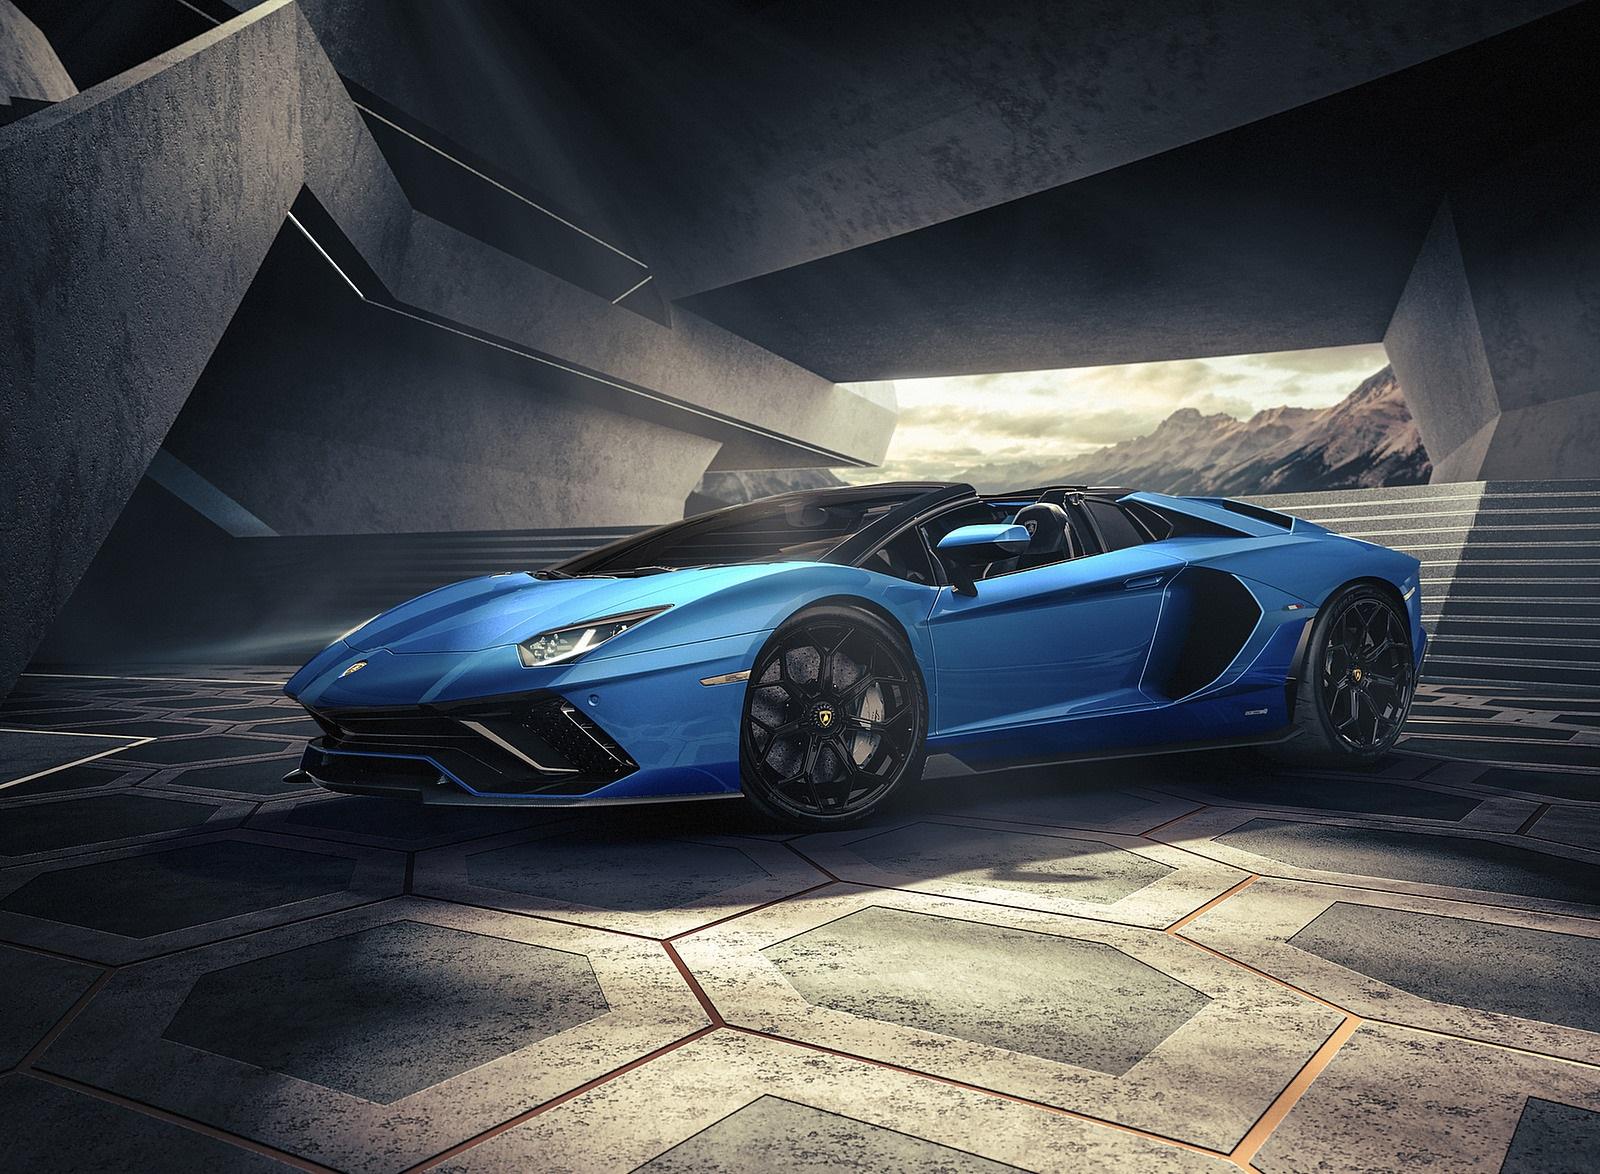 2022 Lamborghini Aventador LP 780-4 Ultimae Roadster Front Three-Quarter Wallpapers (8)